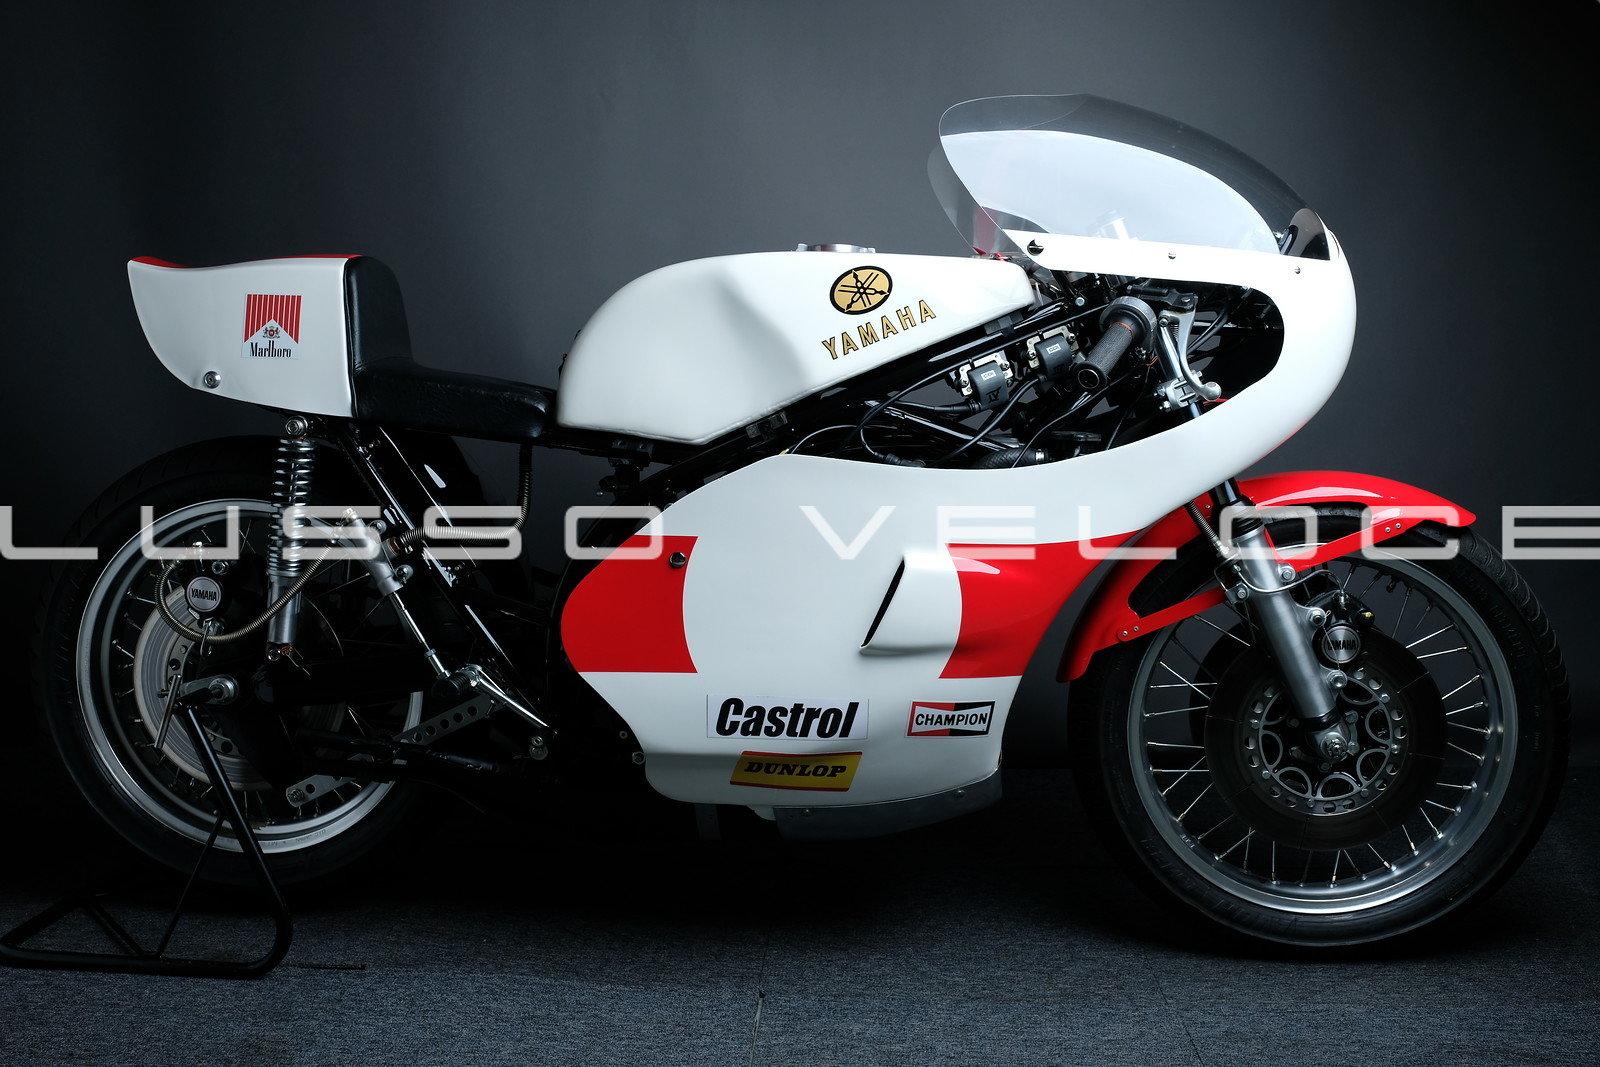 1975 Yamaha TZ 750 C GP Race bike For Sale (picture 1 of 6)